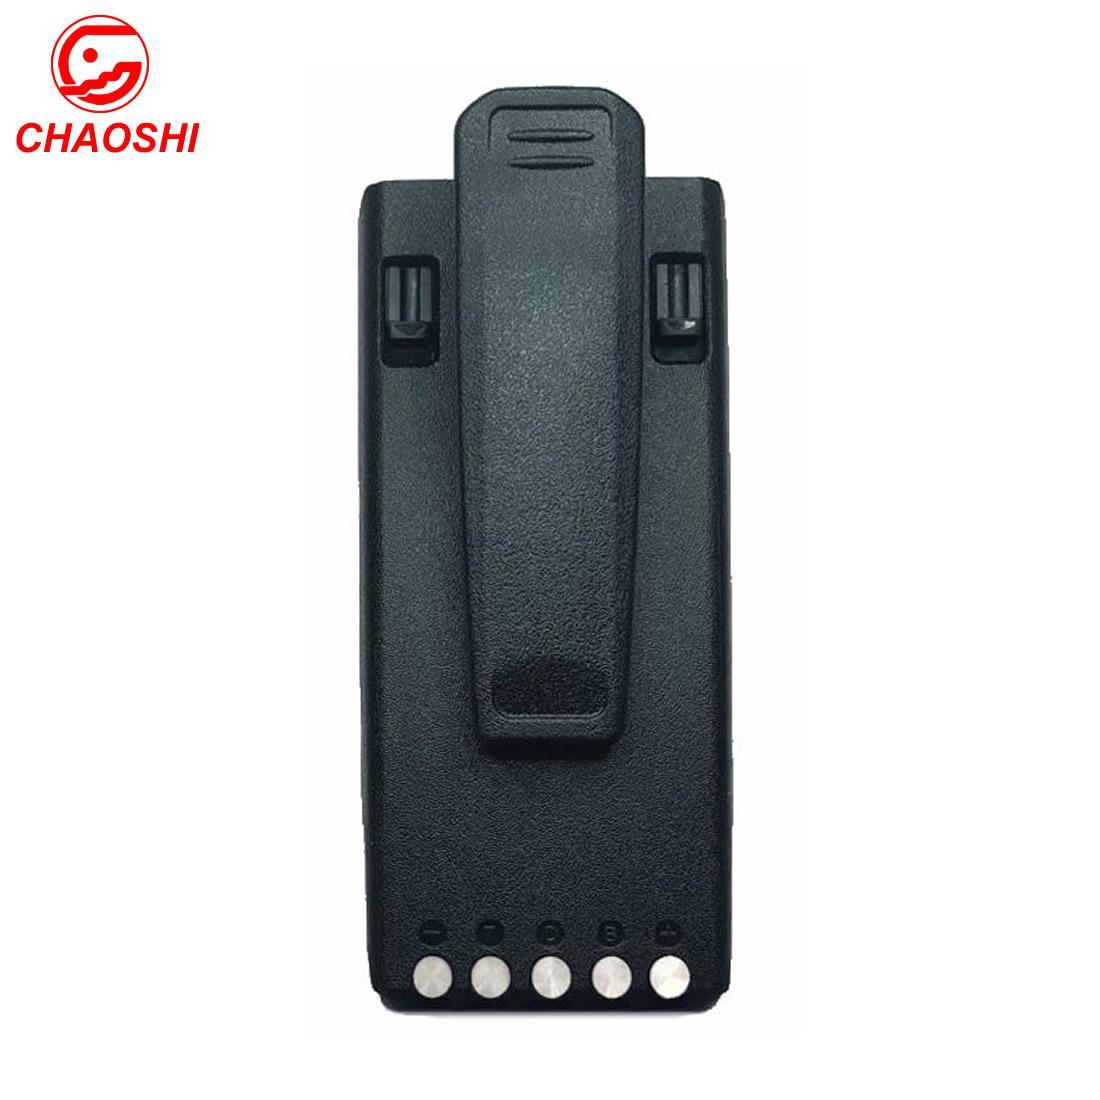 BP283對講機電池 IC-F3400D, IC-F4400D, IC-F70 3